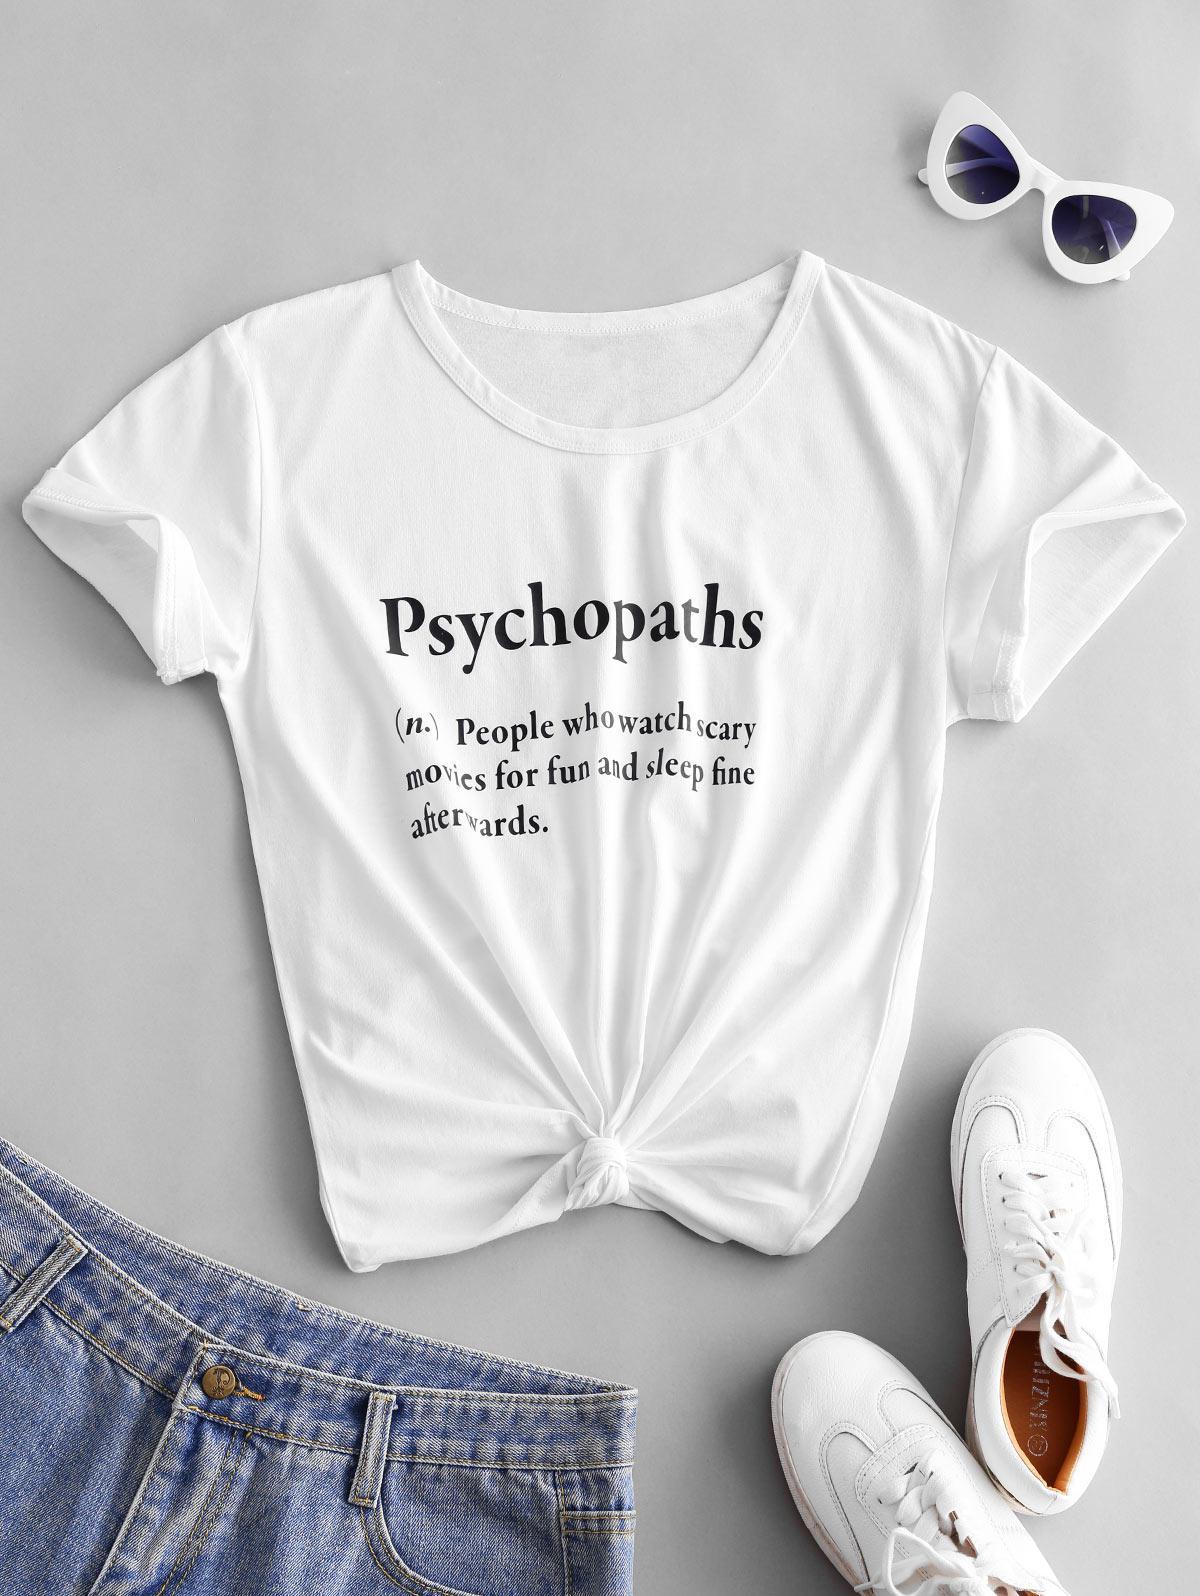 Psychopaths Definition Short Sleeve T-shirt